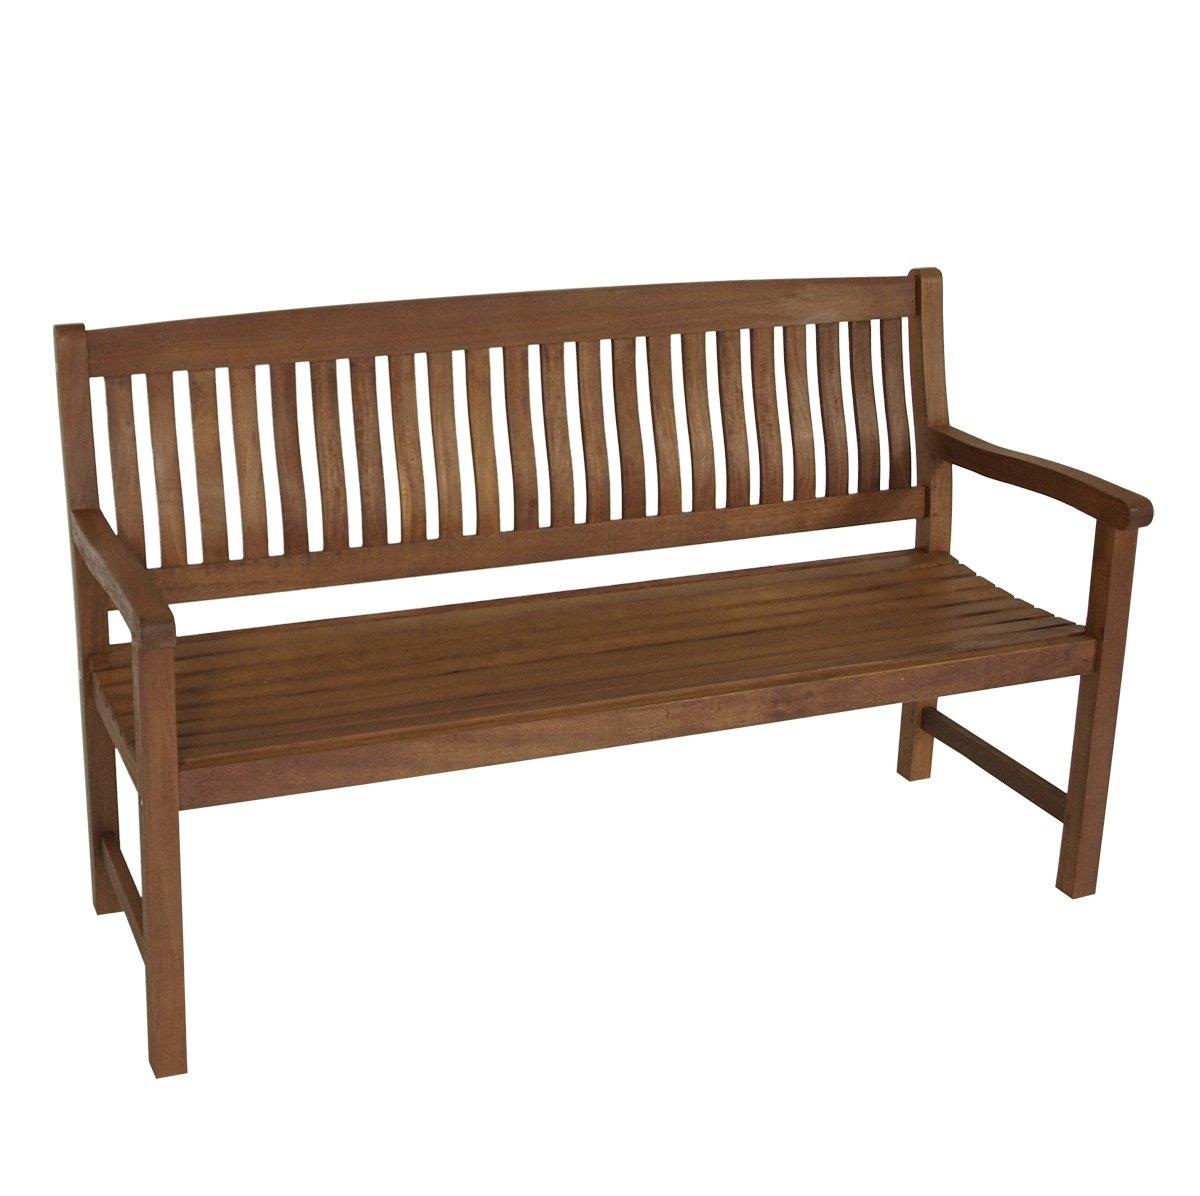 gartenbank manaus 3 sitzer eukalyptus dunkel ge lt fsc. Black Bedroom Furniture Sets. Home Design Ideas